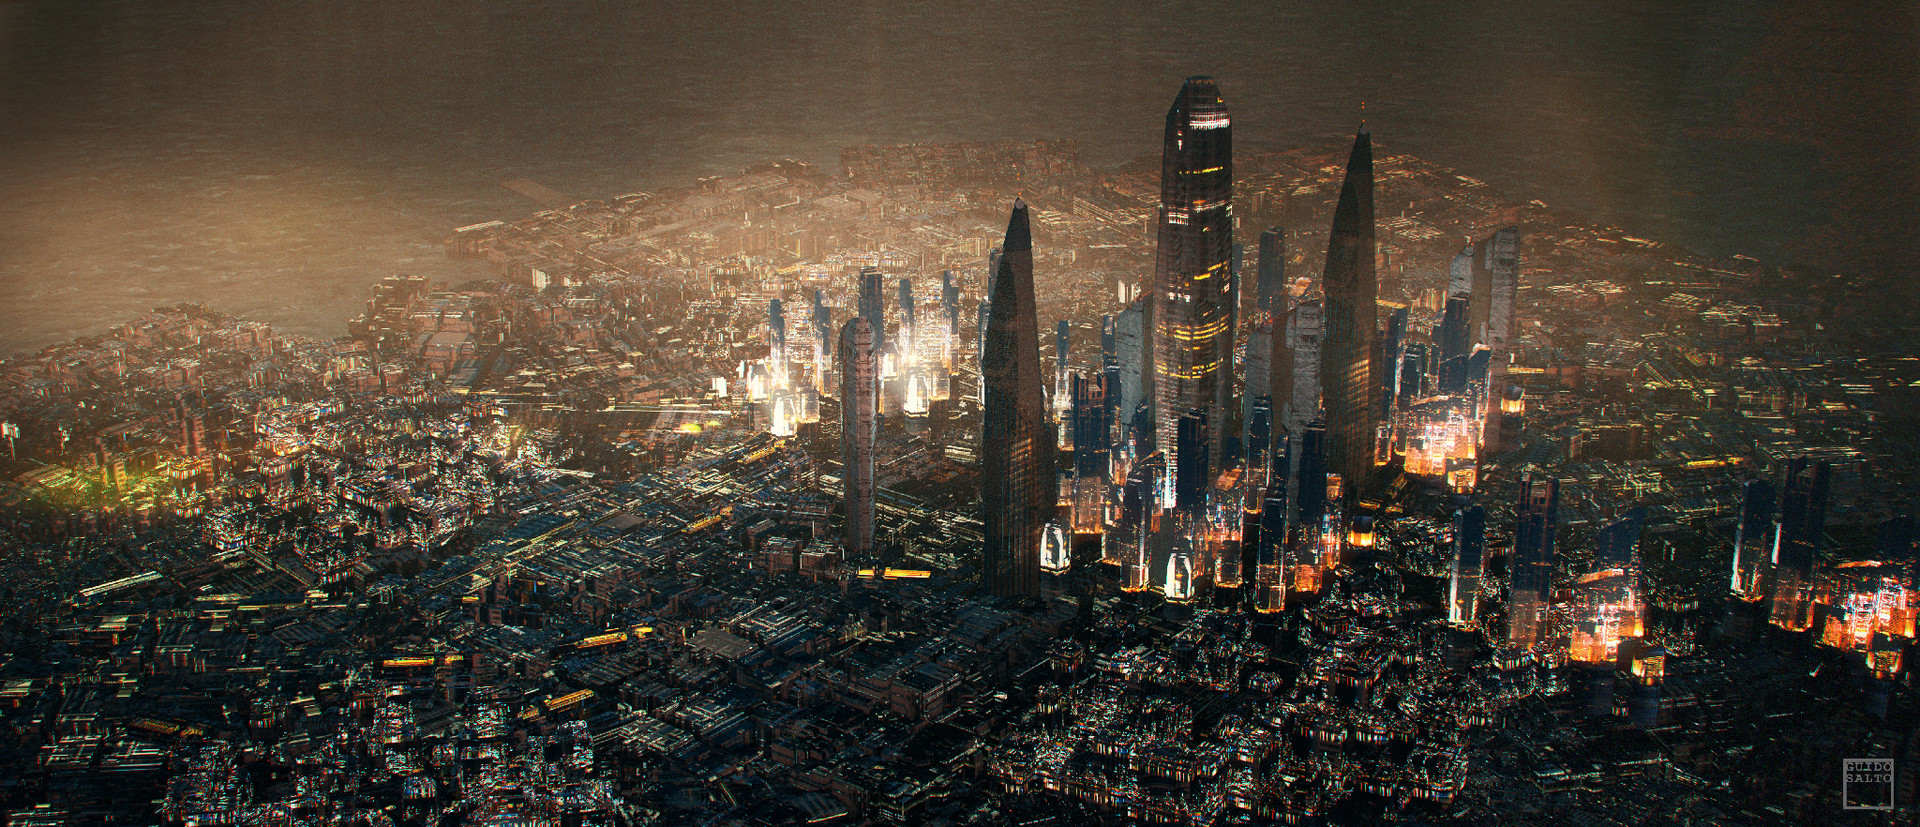 Skyscraper Wallpaper Hd Artstation Cyberpunk City Guido Salto